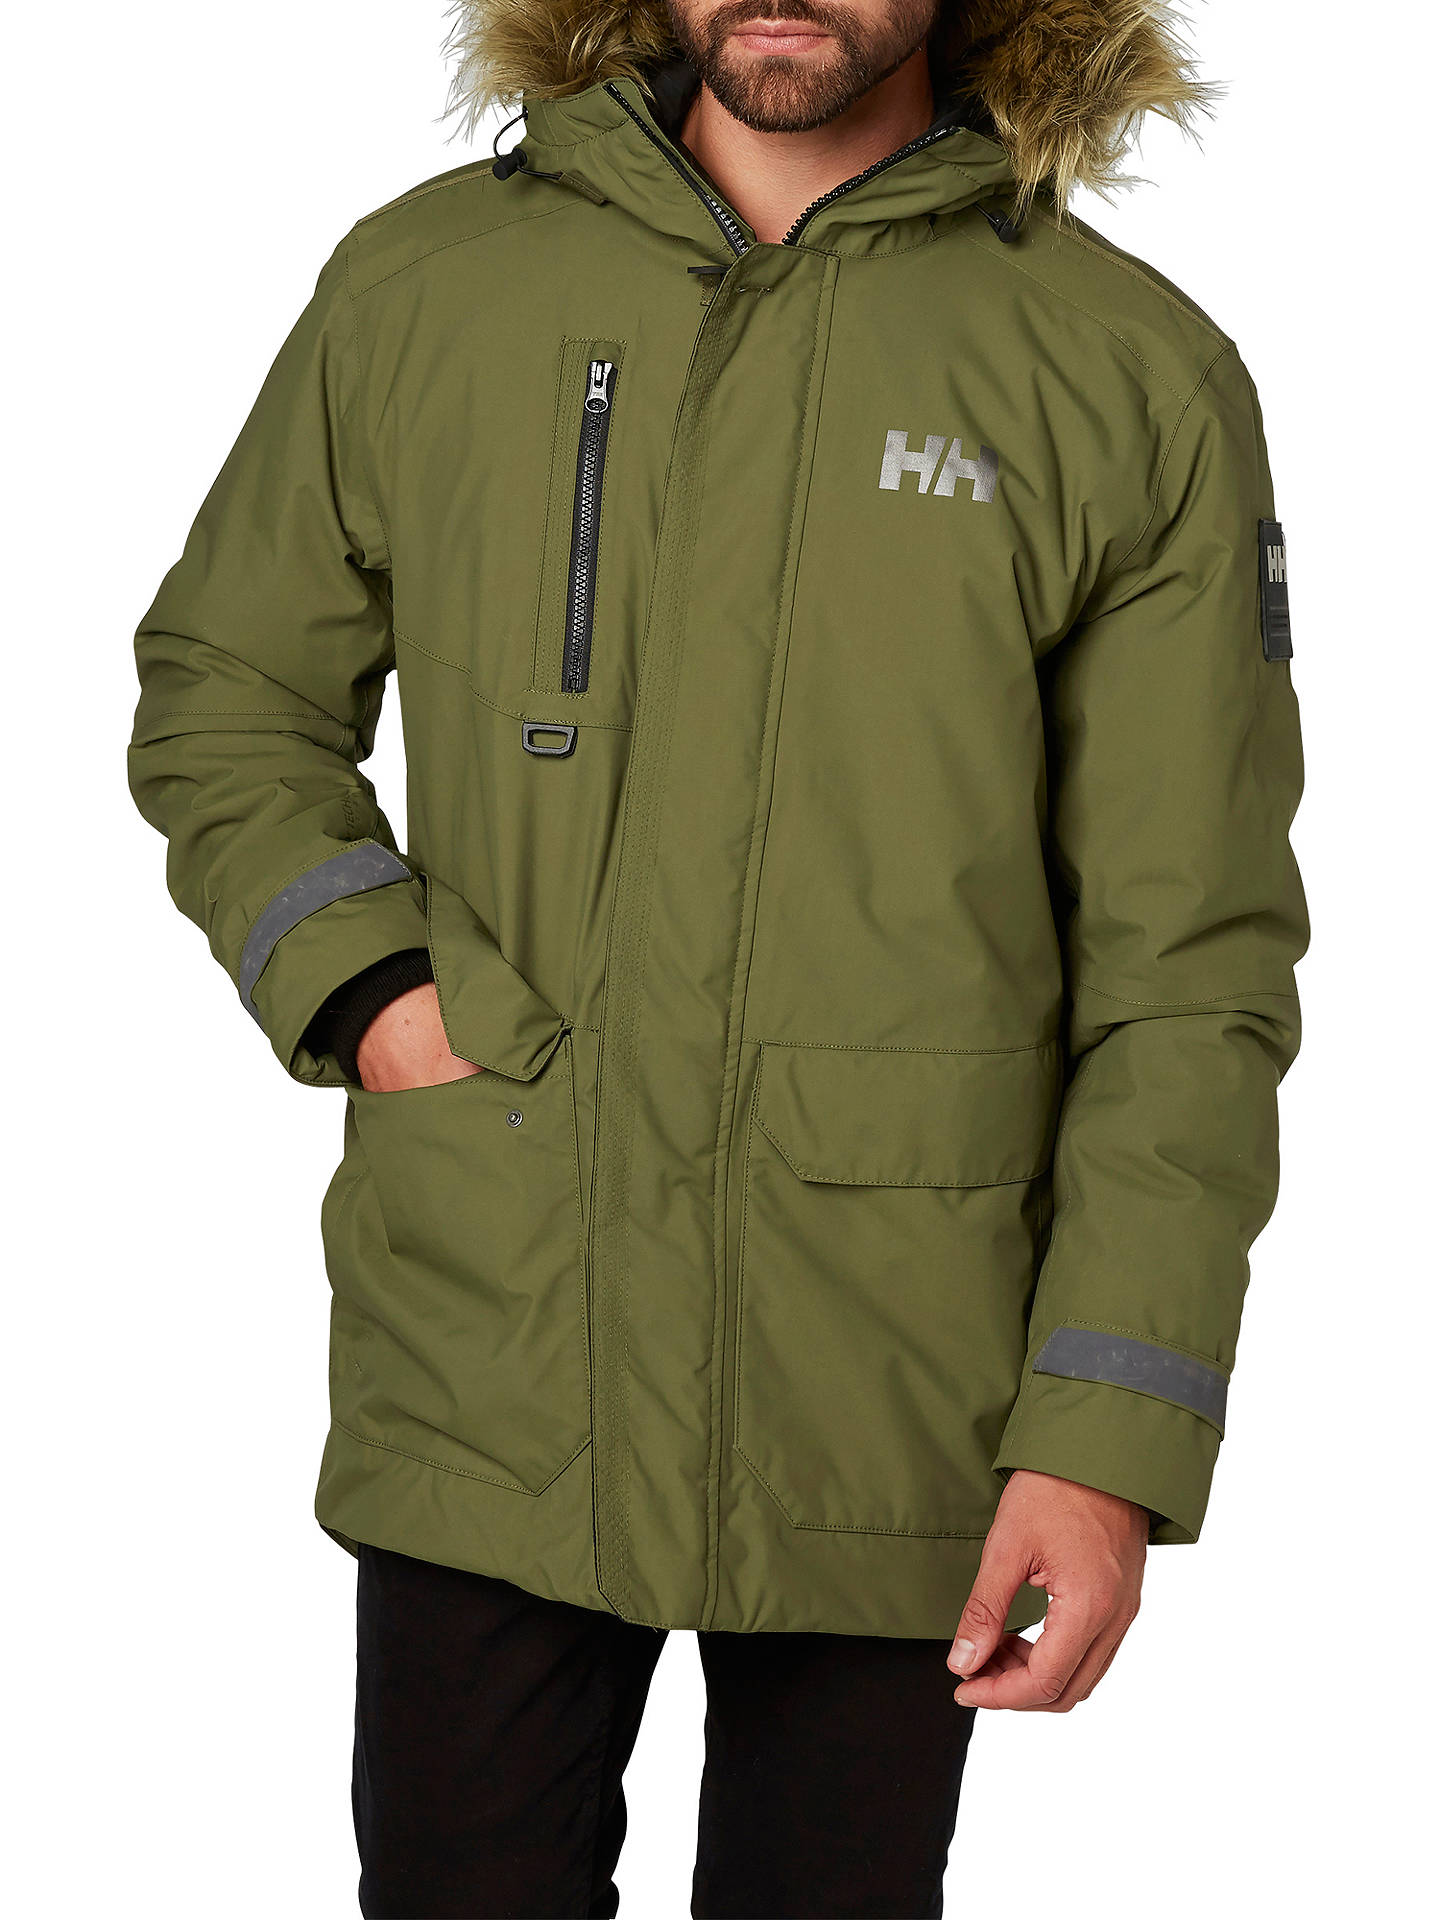 943031ff Buy Helly Hansen Svalbard Waterproof Parka Jacket, Green, S Online at  johnlewis.com ...